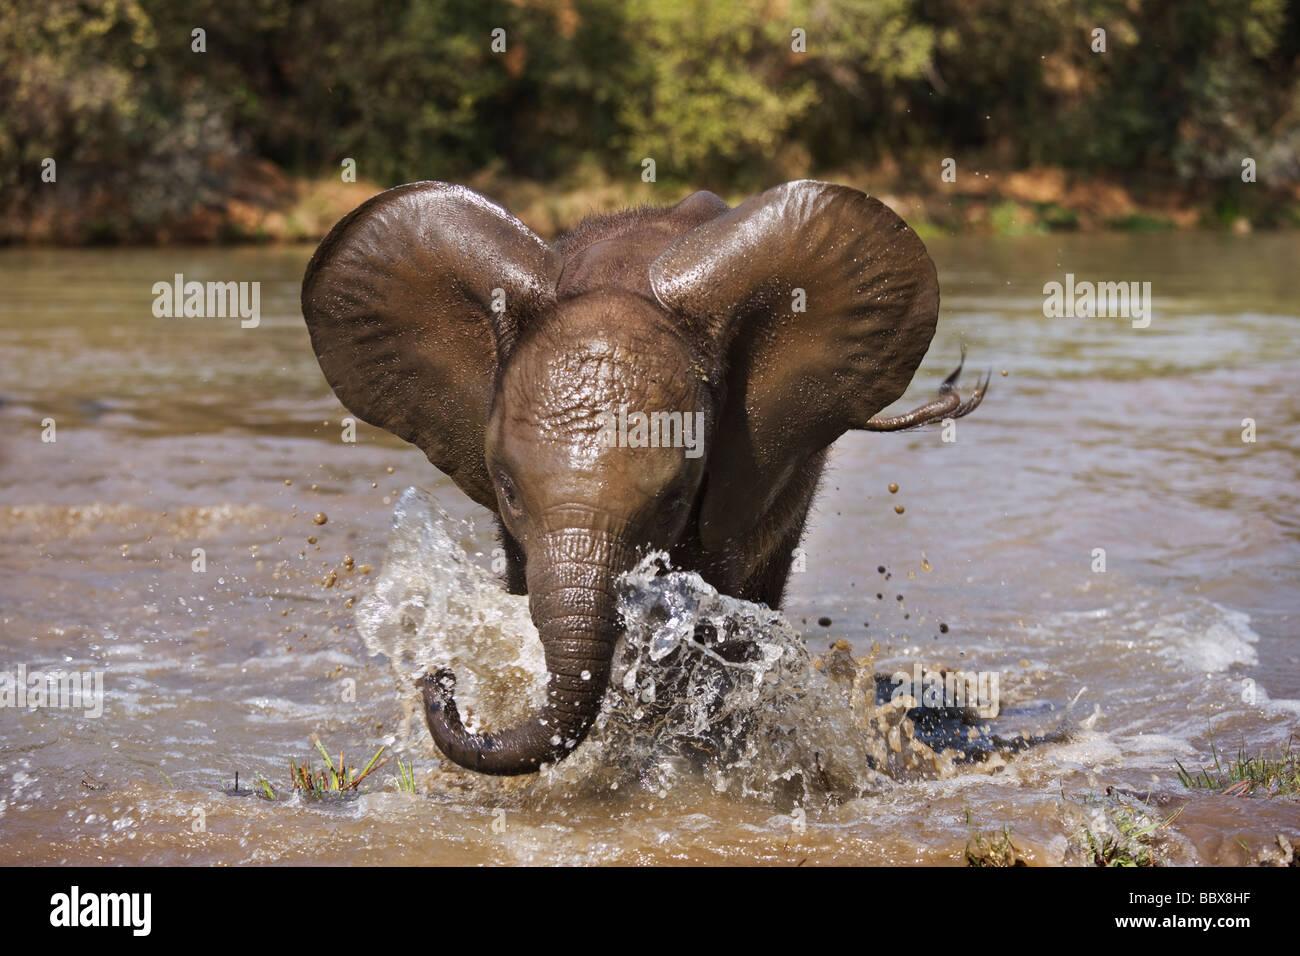 Elefante africano Loxodonta africana vitello giovane carica play Sud Africa Dist Africa Subsahariana Immagini Stock